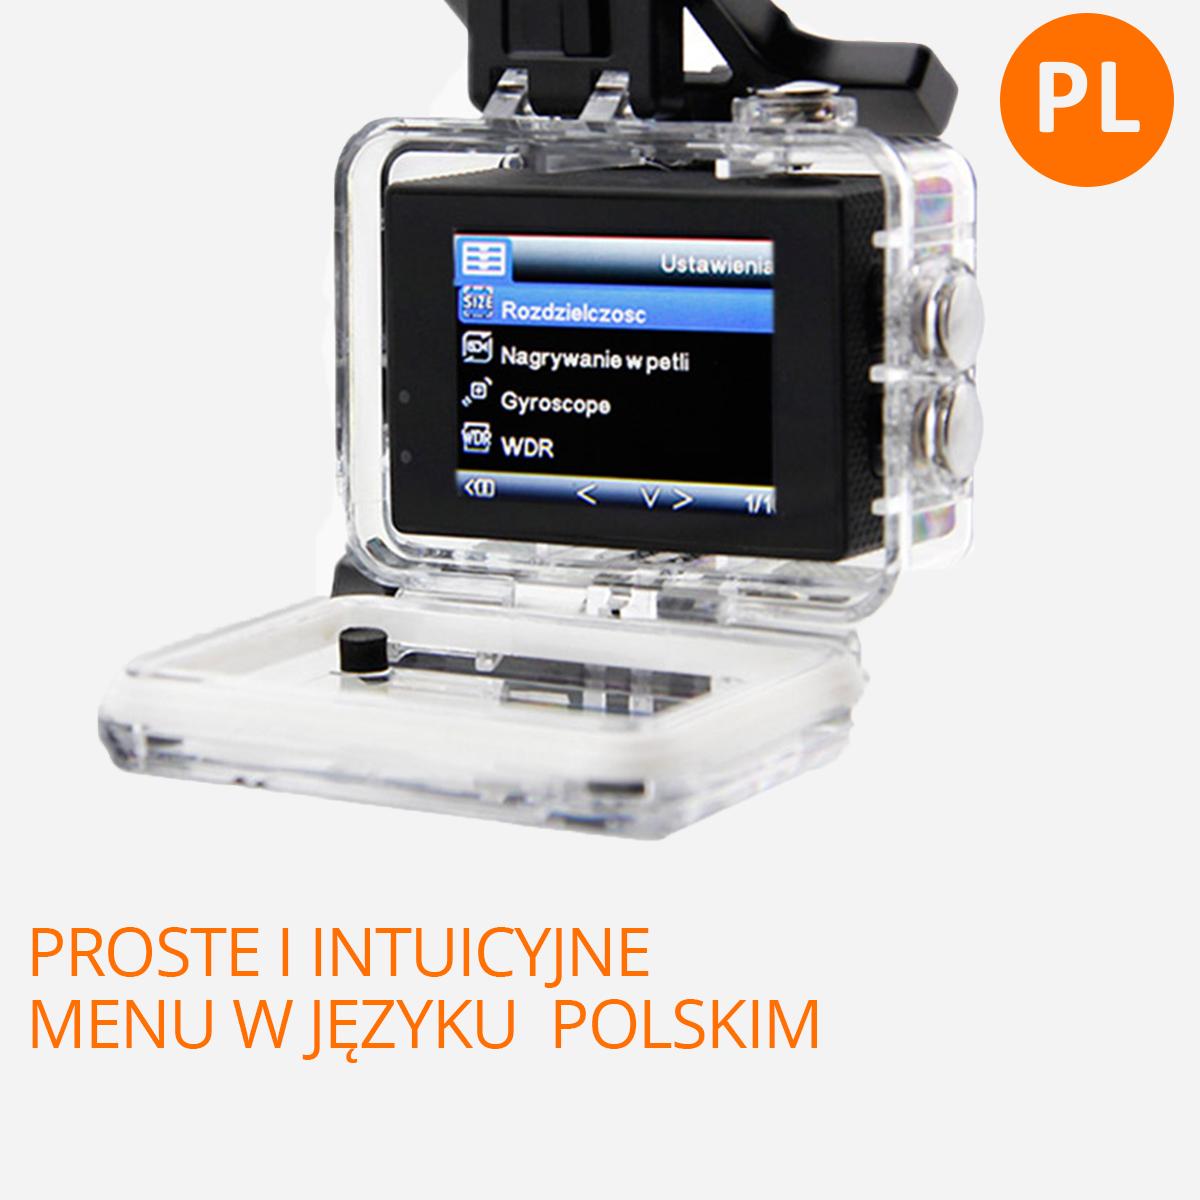 kamera sportowa polskie menu orllo.pl